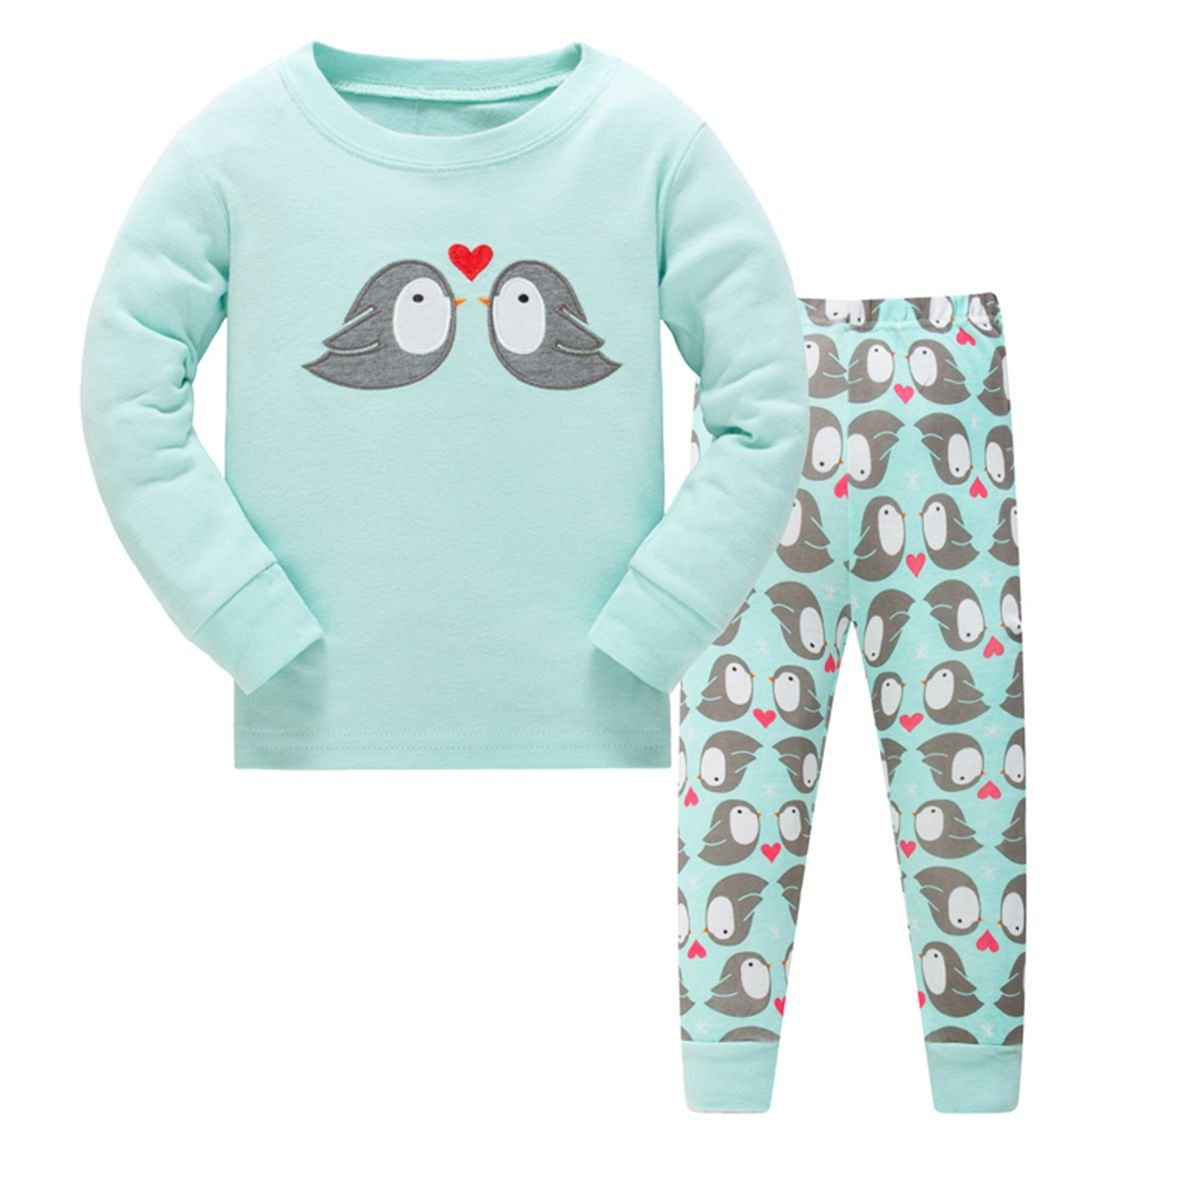 Girls Pajamas Love in Birds Children Pjs Kid Rib Long Sleeves Cotton Clothes Set